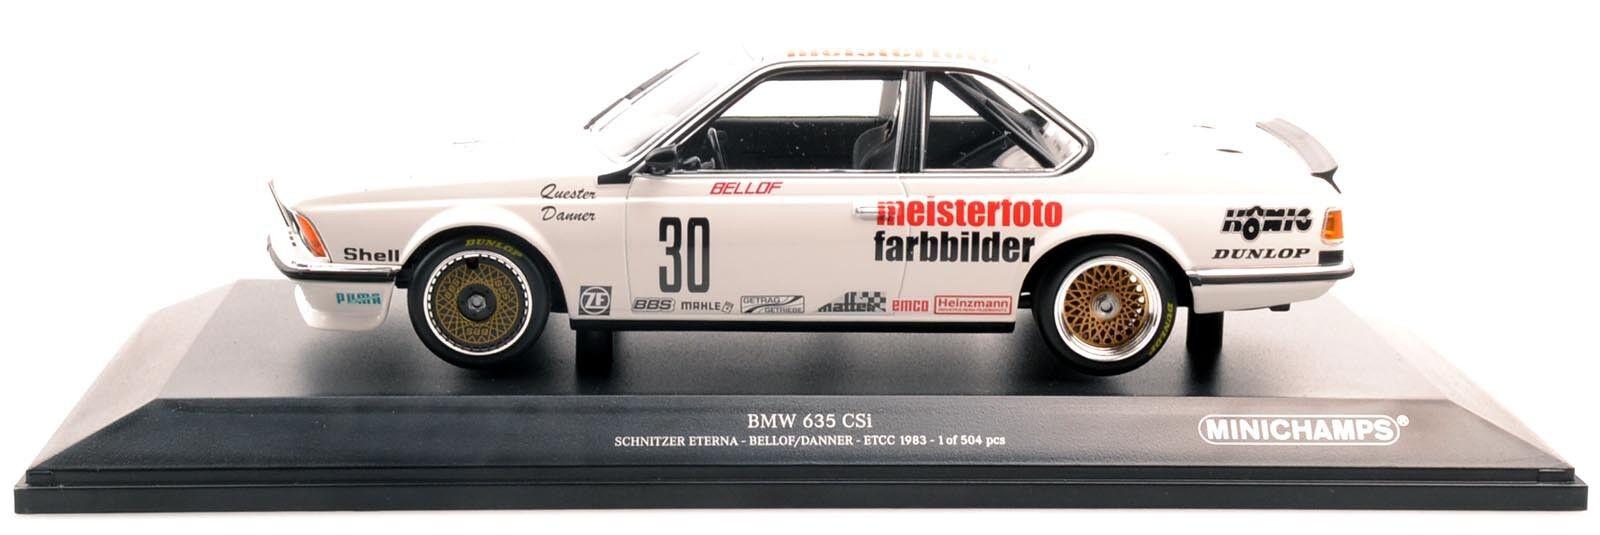 MINICHAMPS 155832530 BMW 635 CSI Schnitzler Bellof Danner ETCC 1983 1 18 Nouveau Neuf dans sa boîte